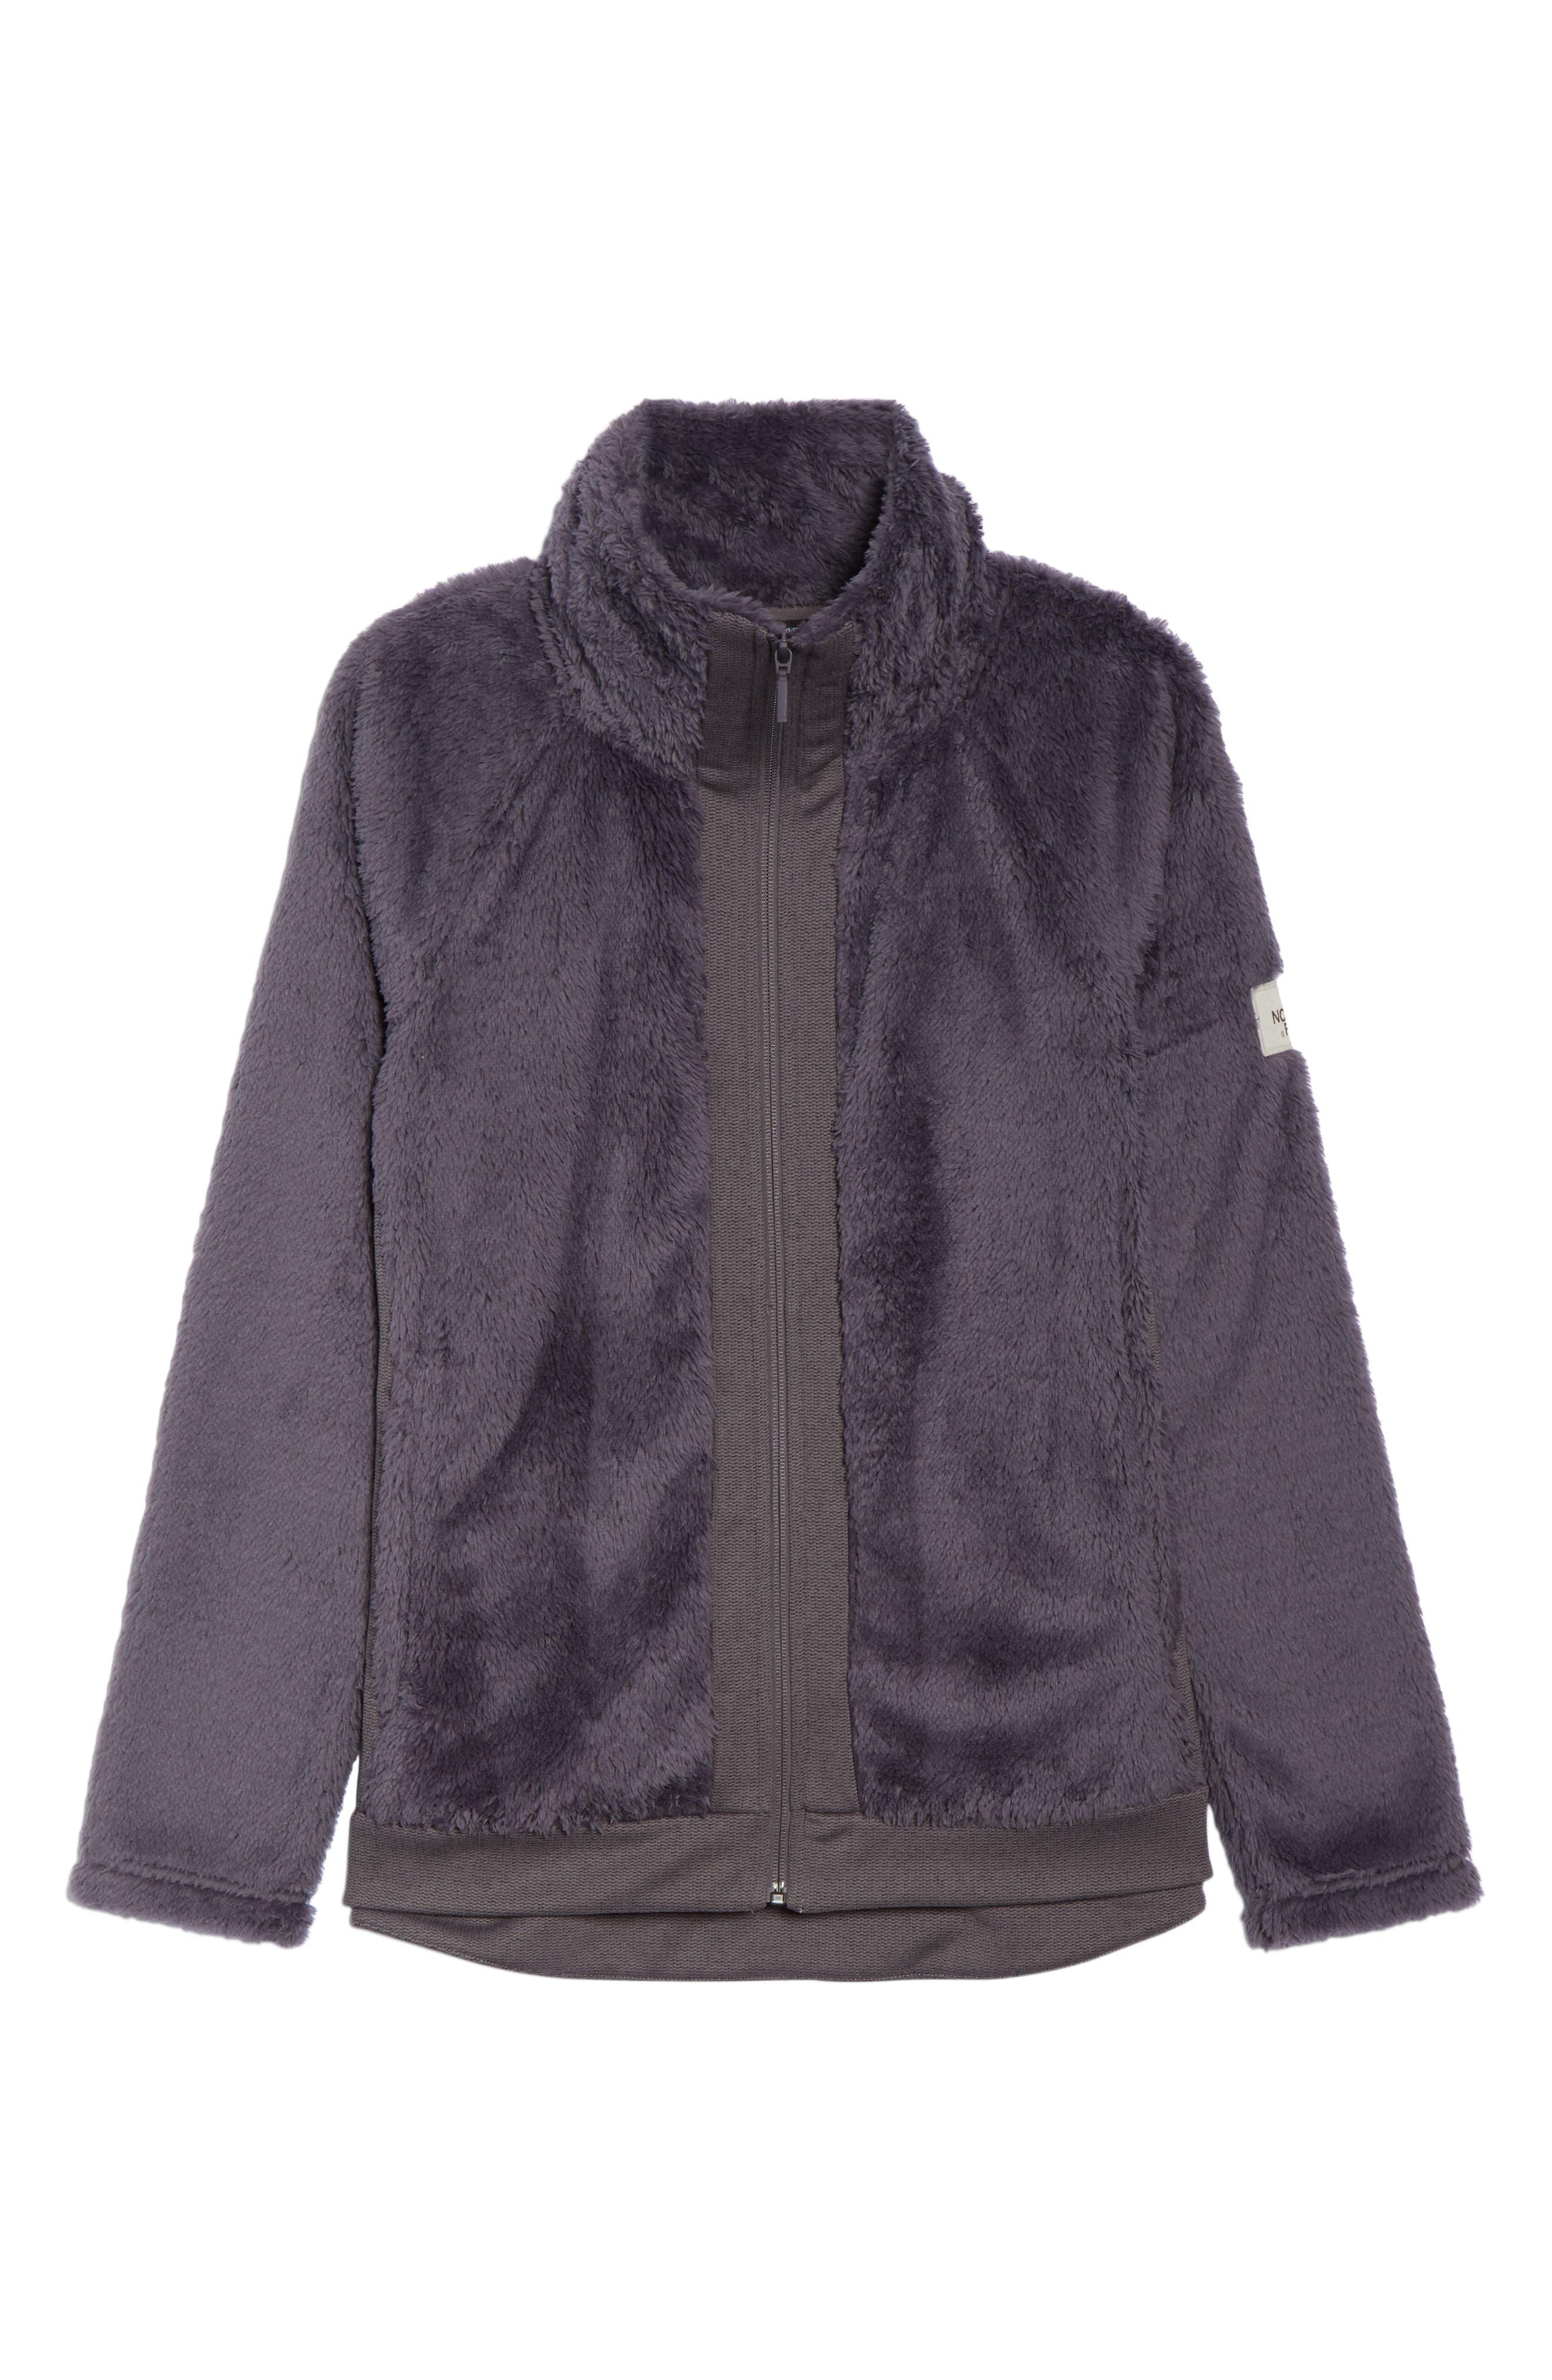 Furry Fleece Jacket,                             Alternate thumbnail 6, color,                             021